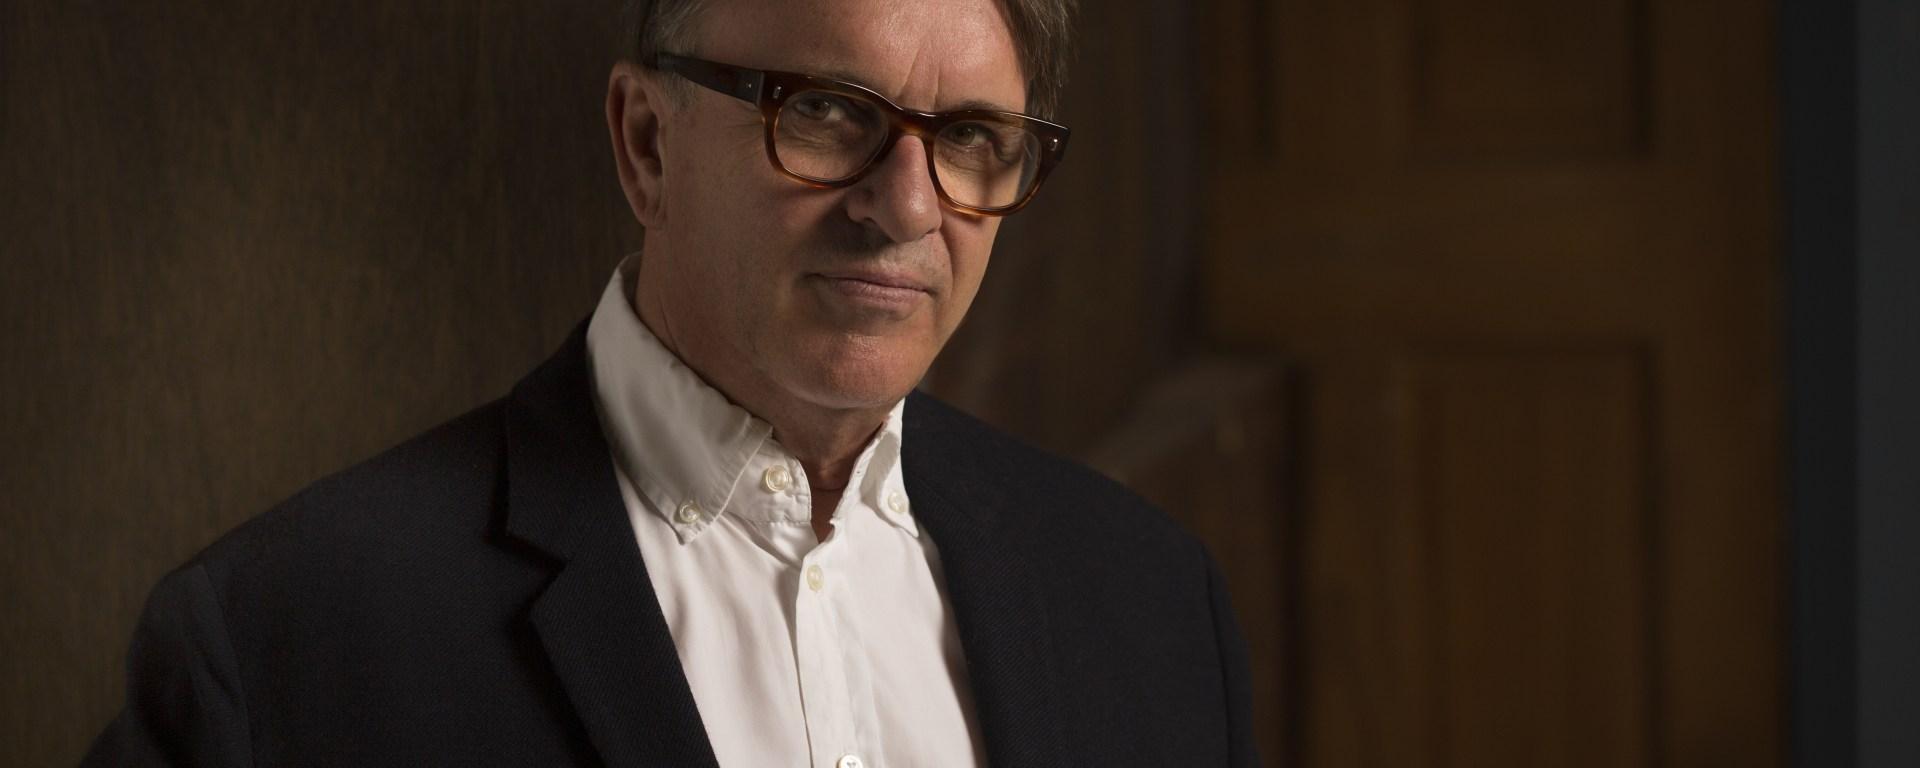 Photograph of a slightly older gentleman with dark-framed glasses